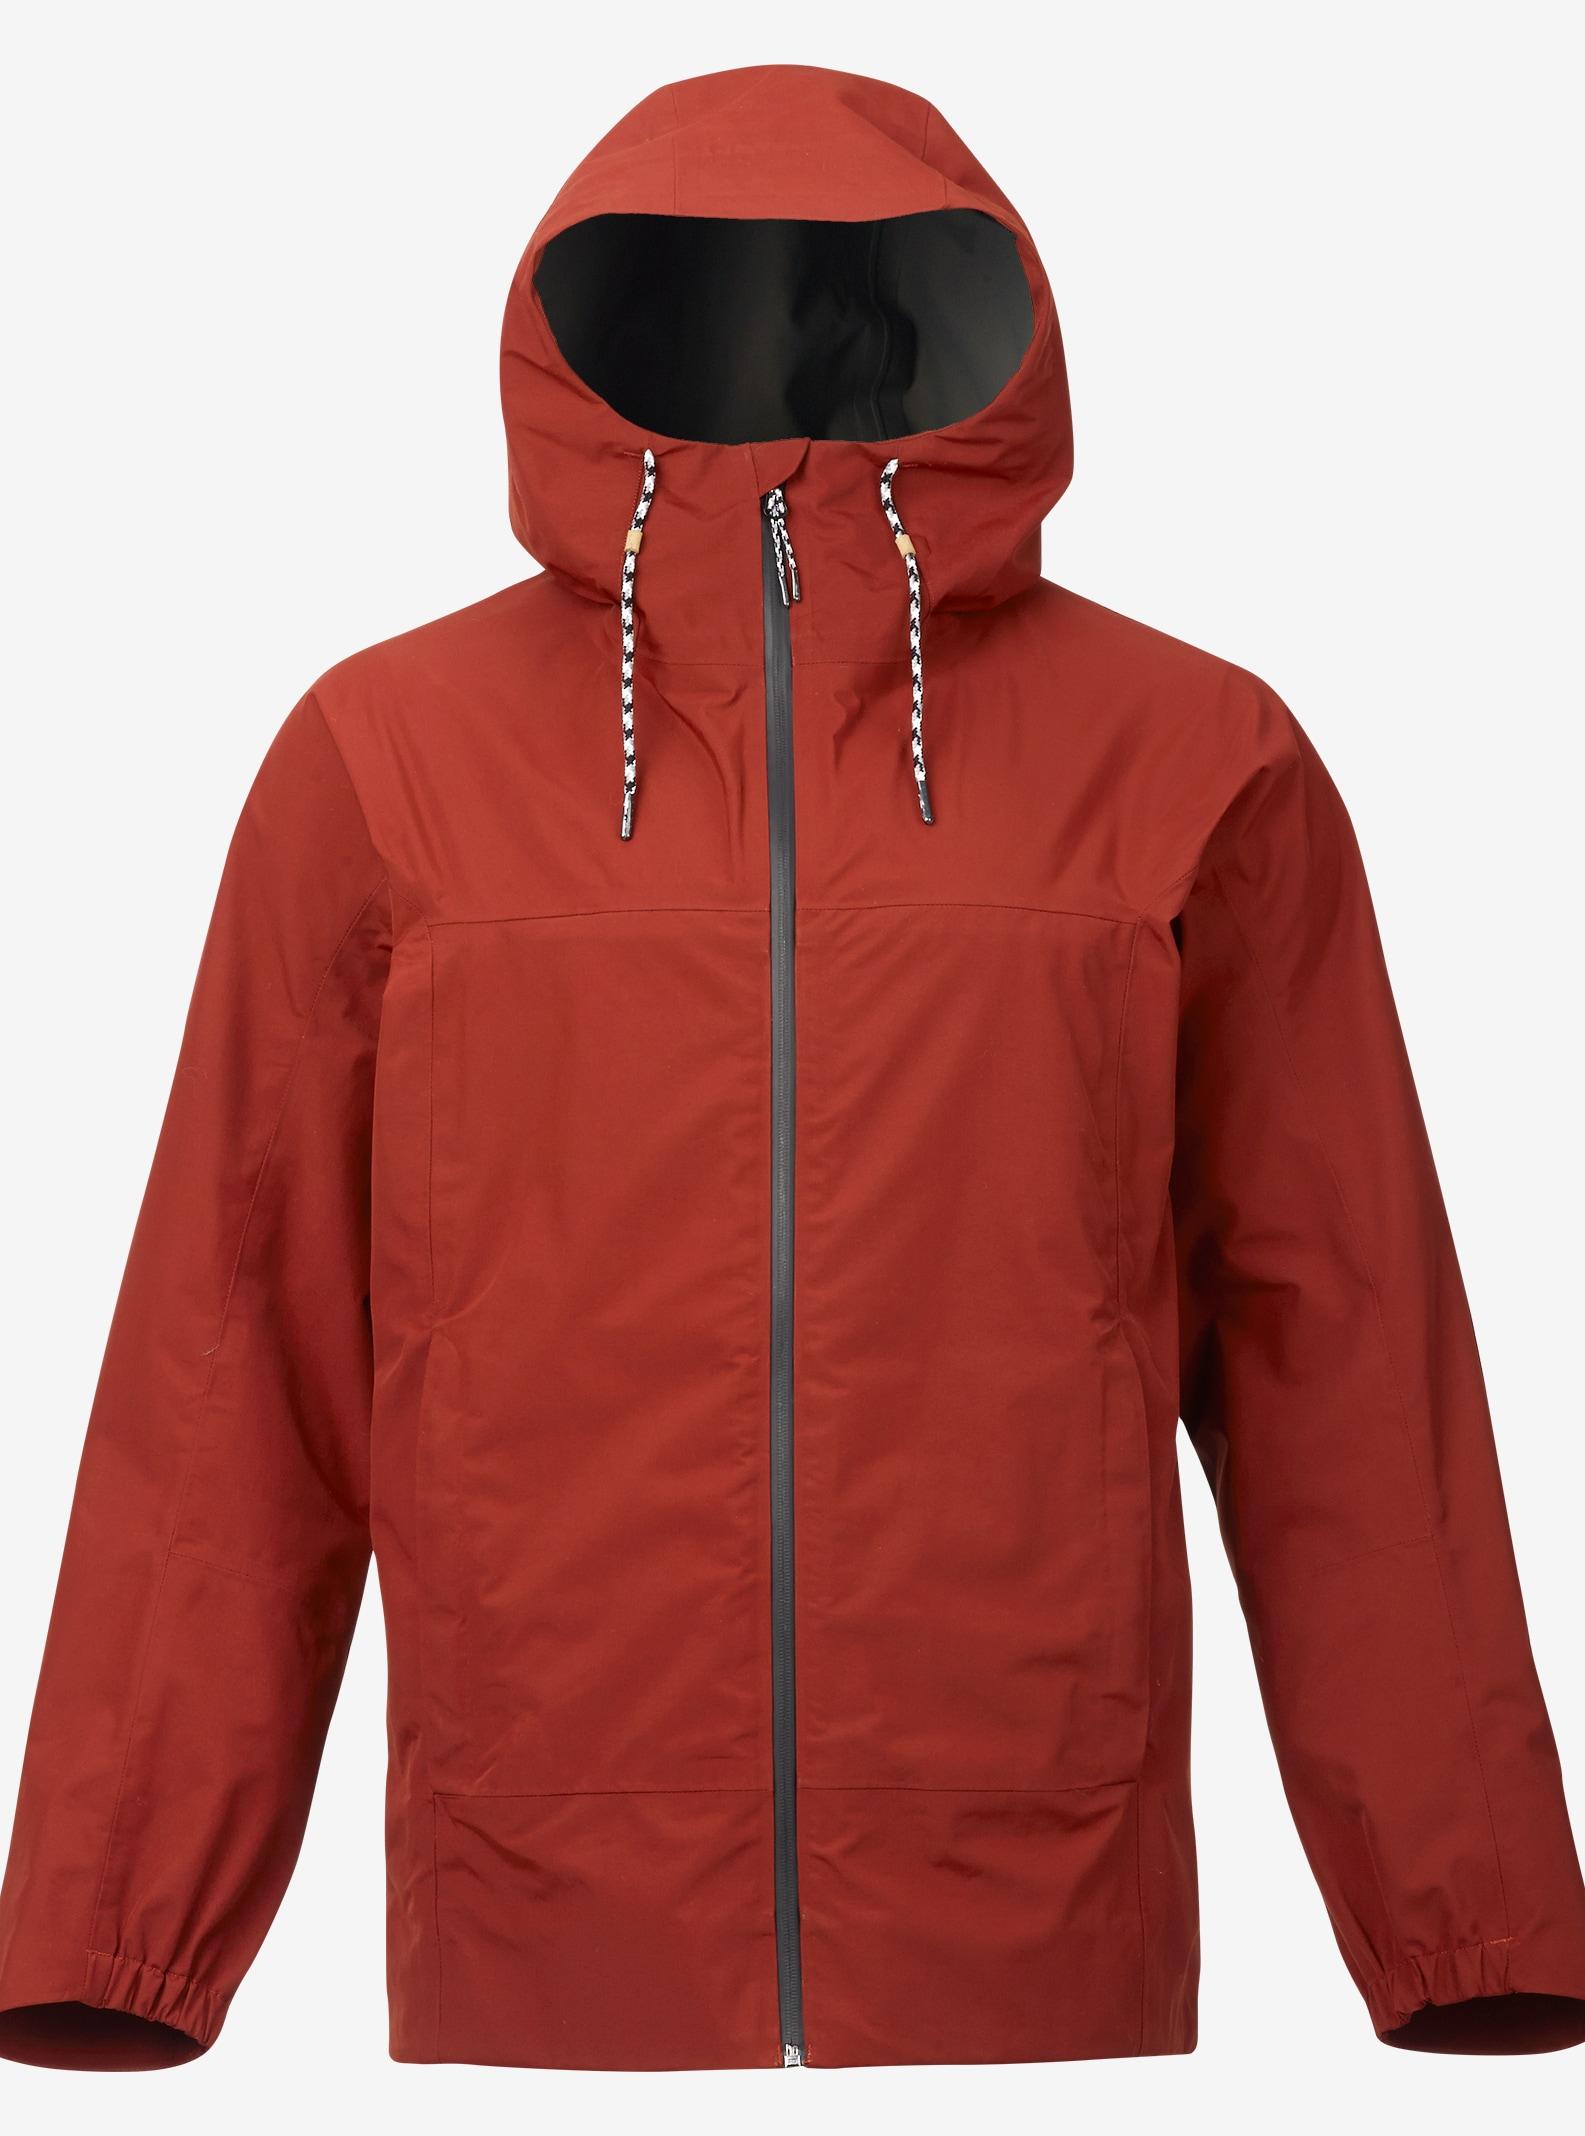 Burton GORE-TEX® 2L Packrite Rain Jacket shown in Tandori